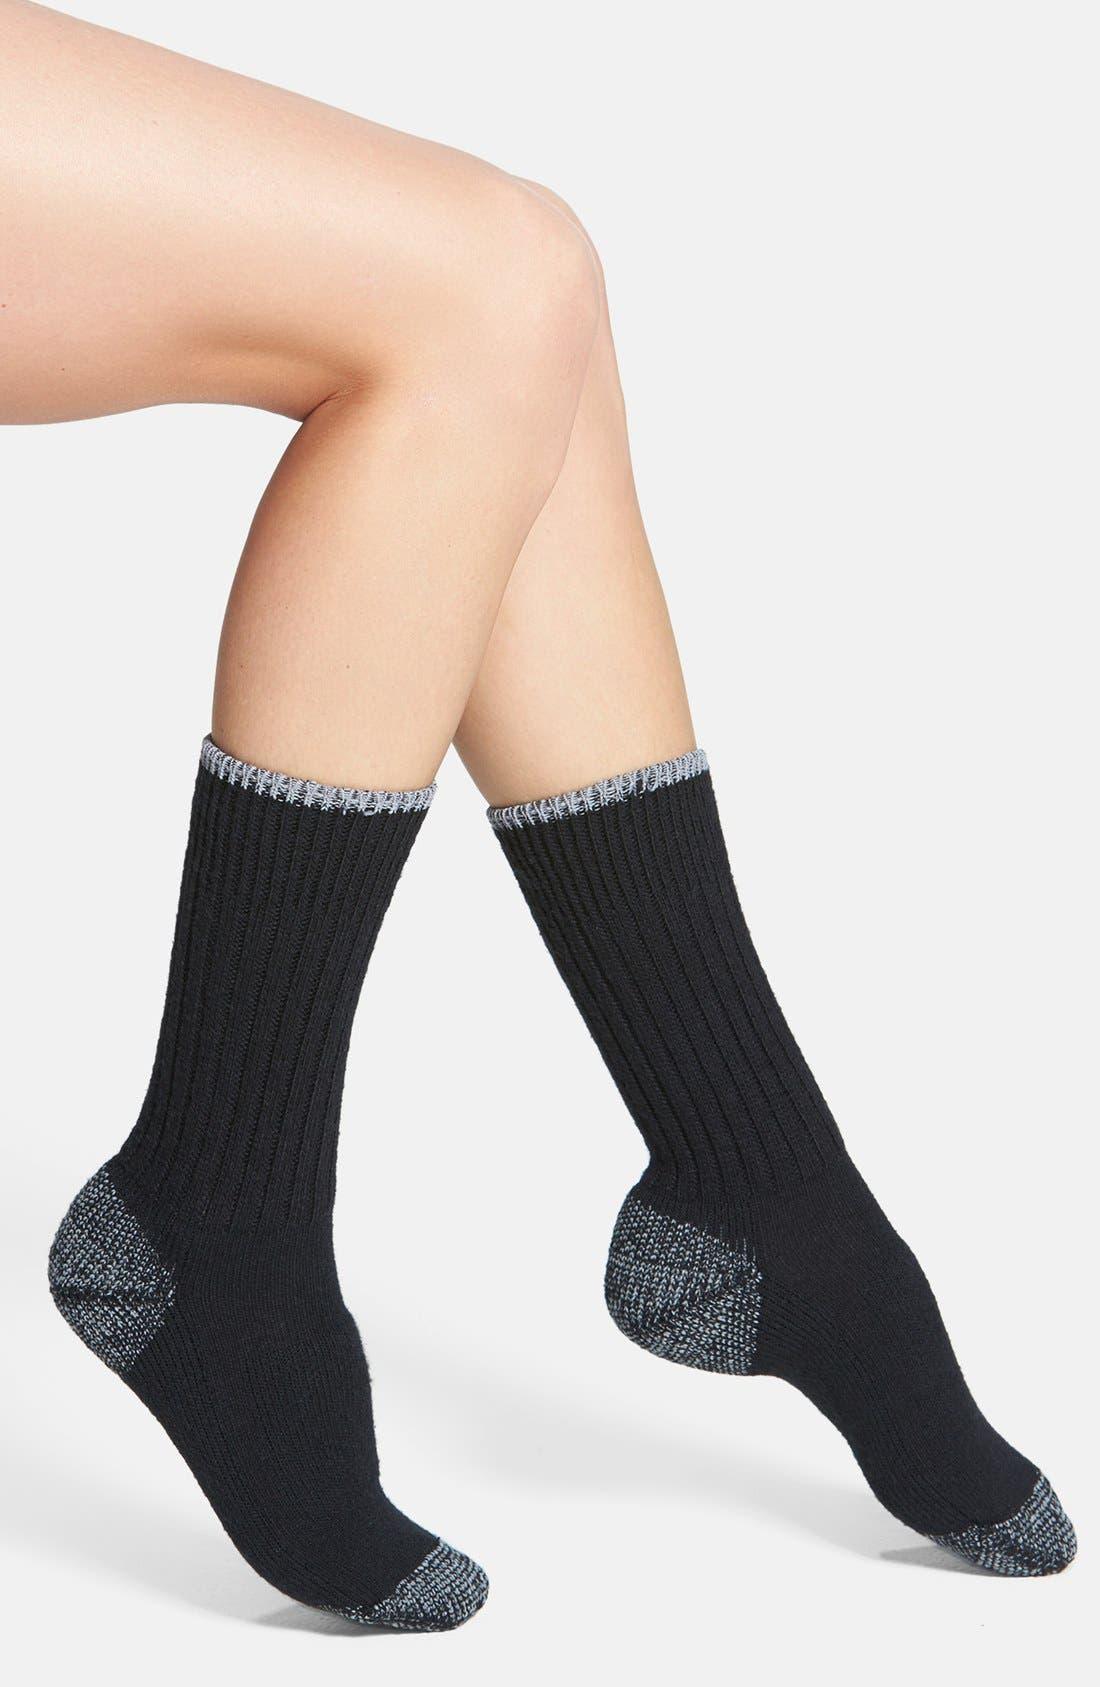 Alternate Image 1 Selected - Wigwam 'All Weather' Socks